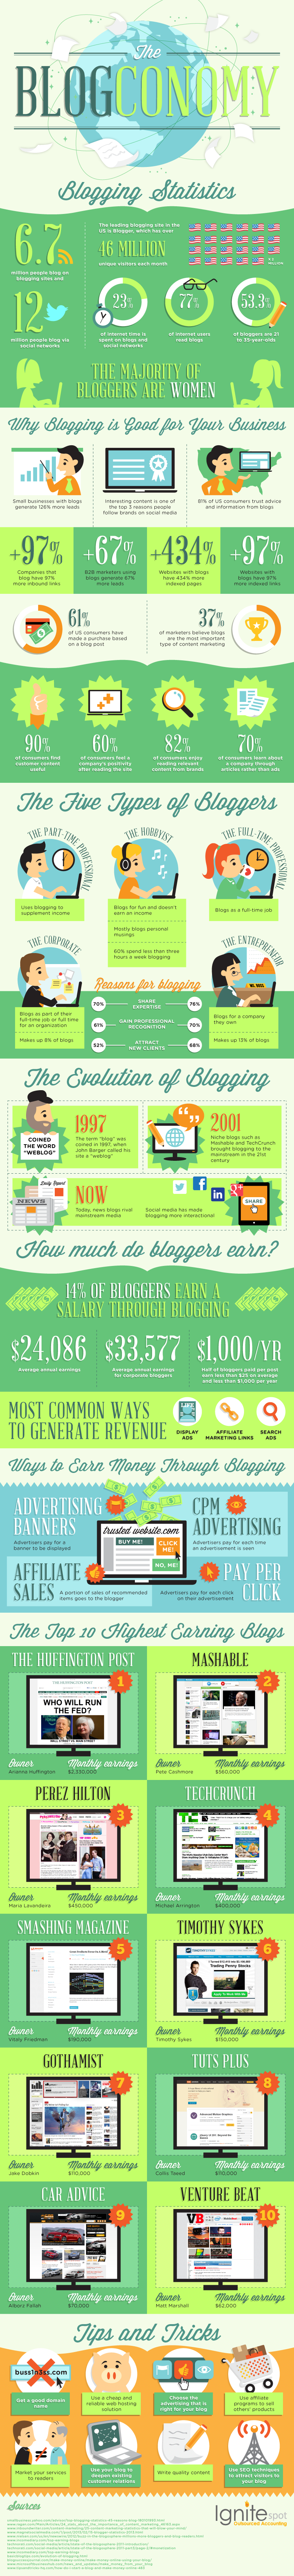 Make-from-Blogging